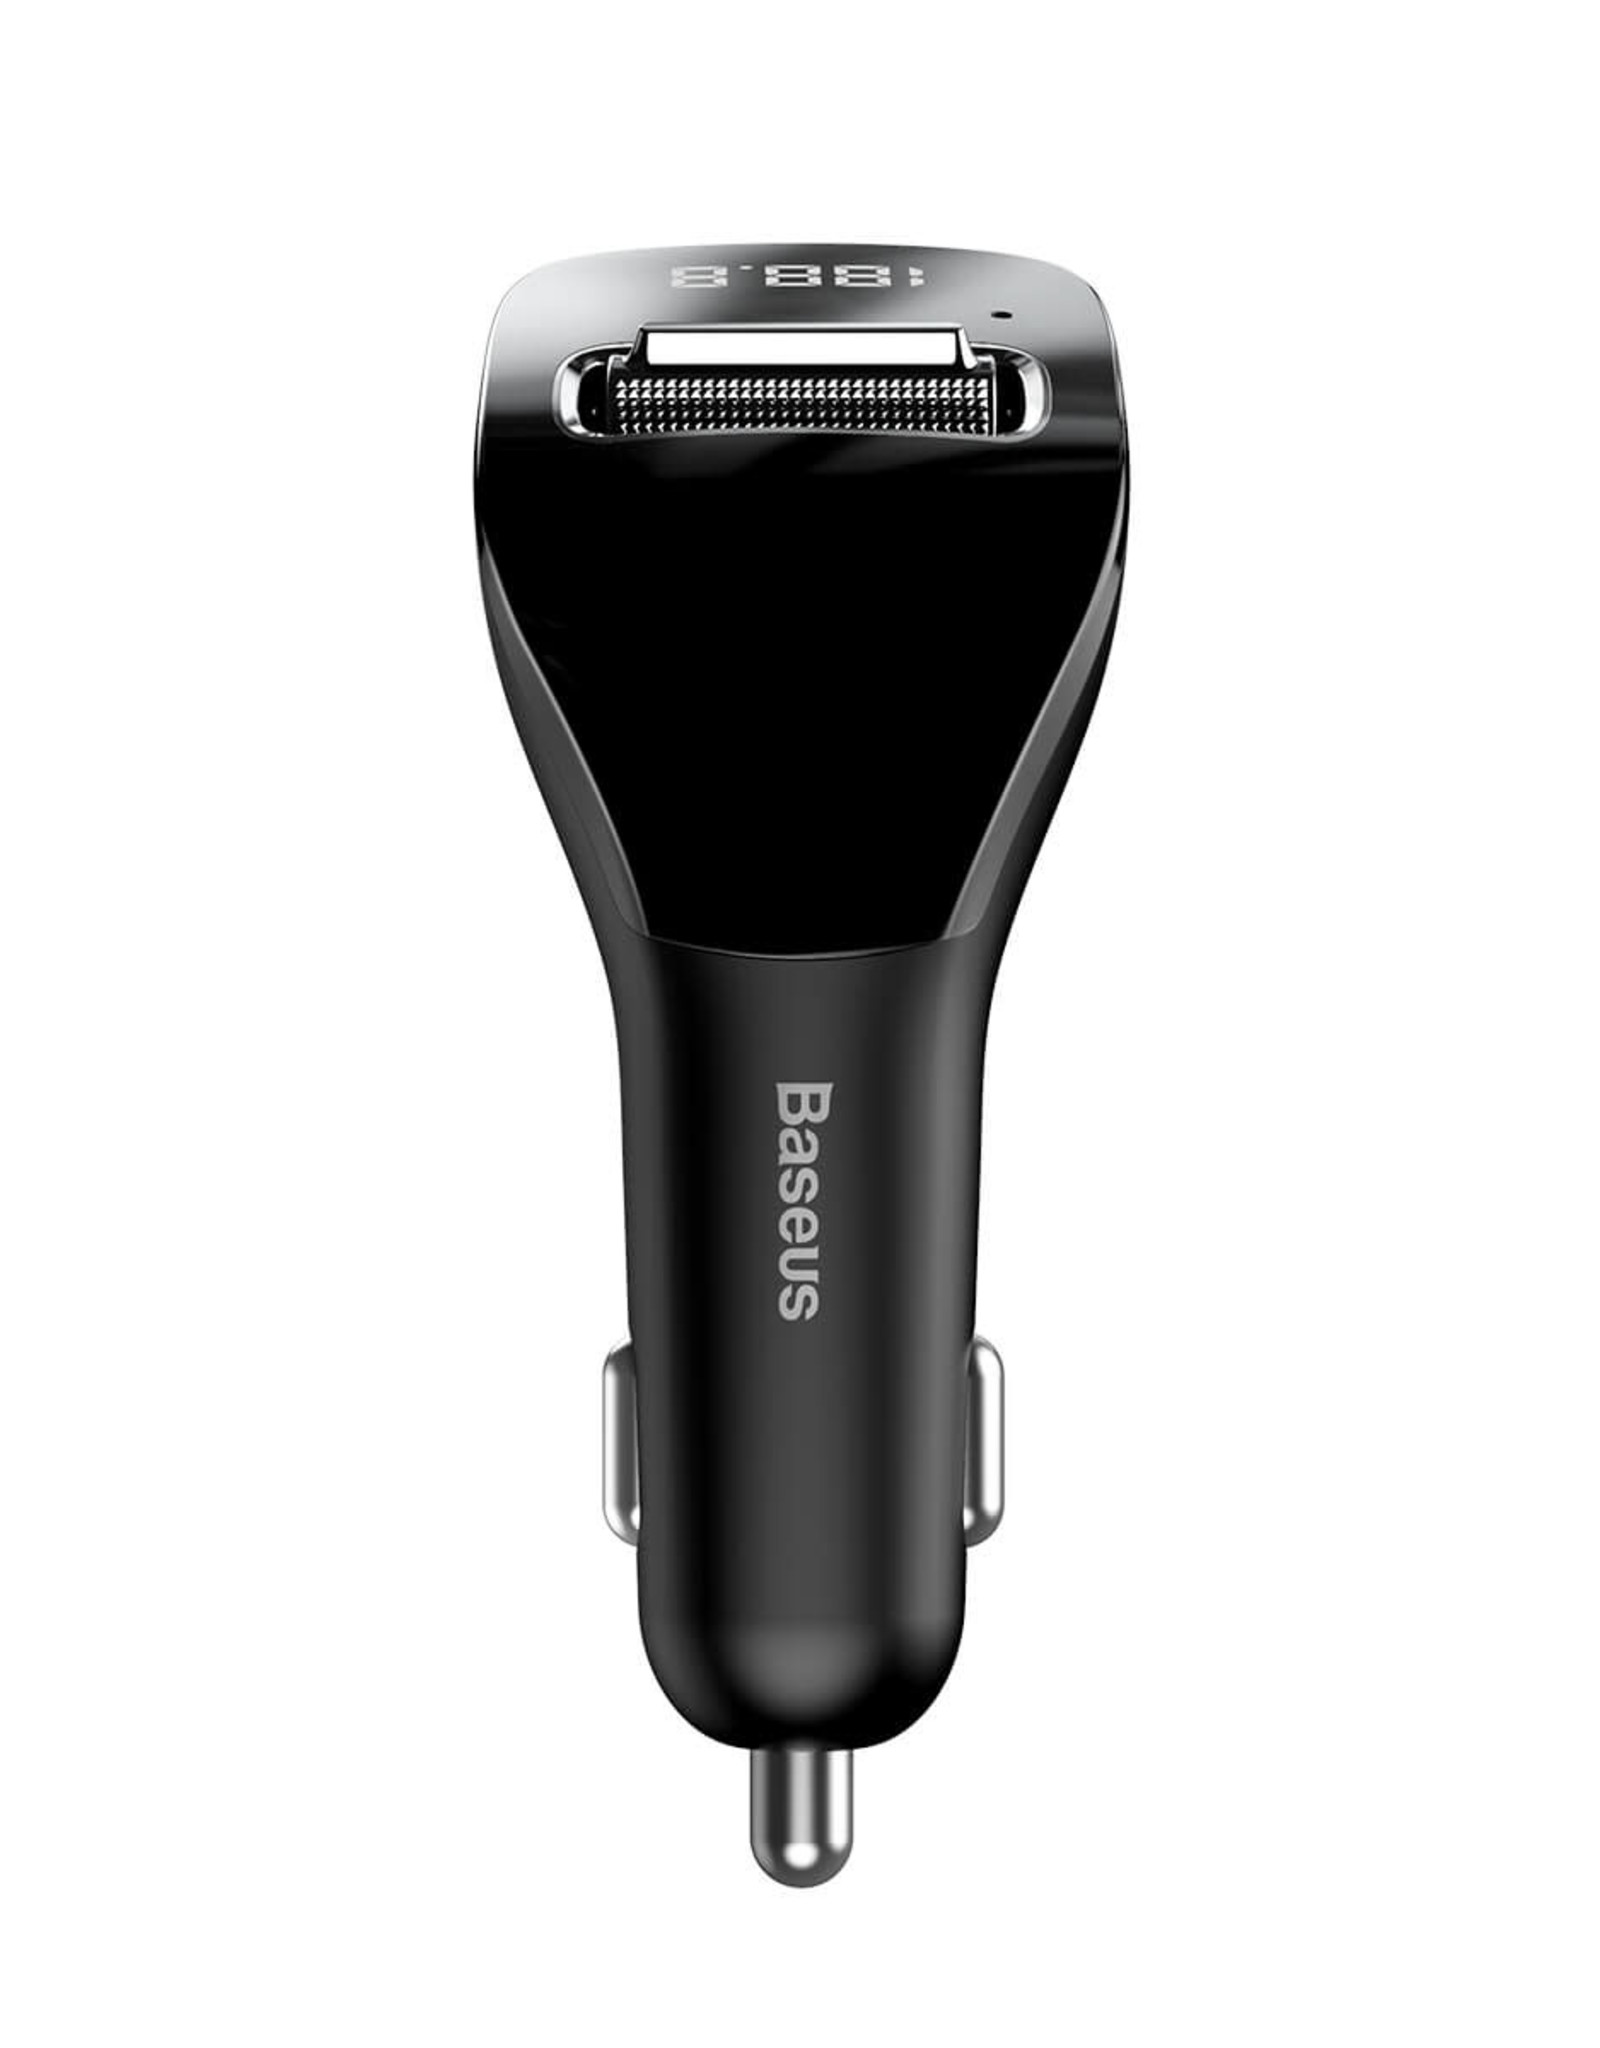 Baseus Baseus Streamer F40 AUX wireless MP3 car charger Black